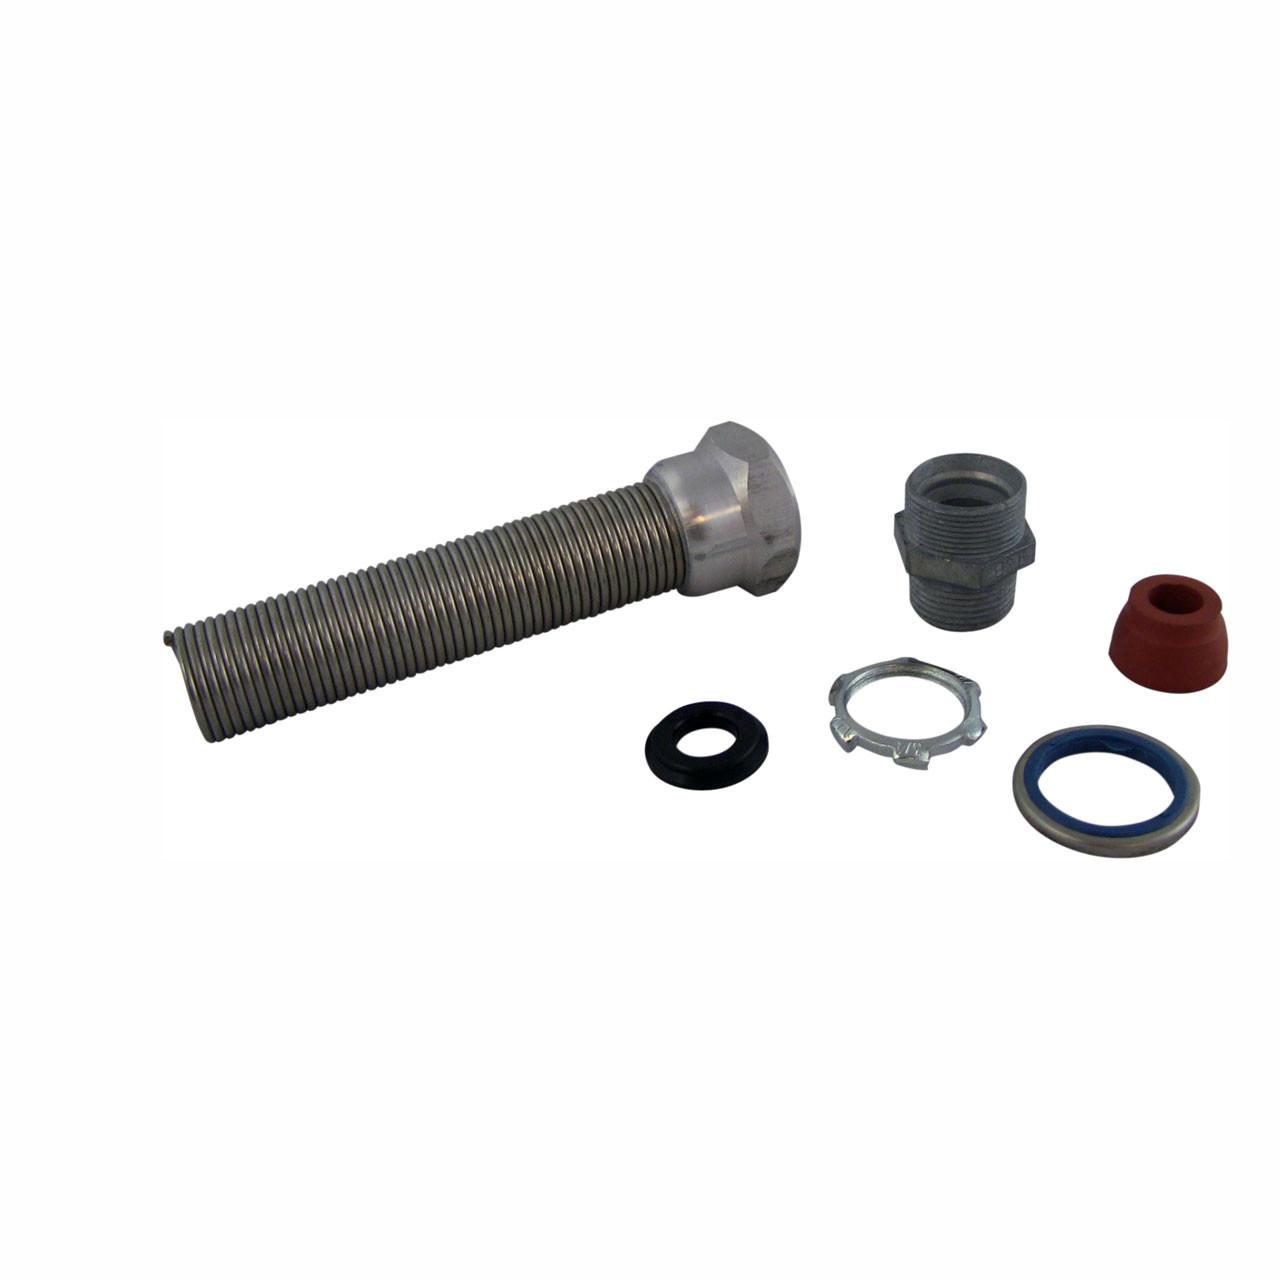 Junction Box Strain Relief Kit For Orange Thermistor Cords